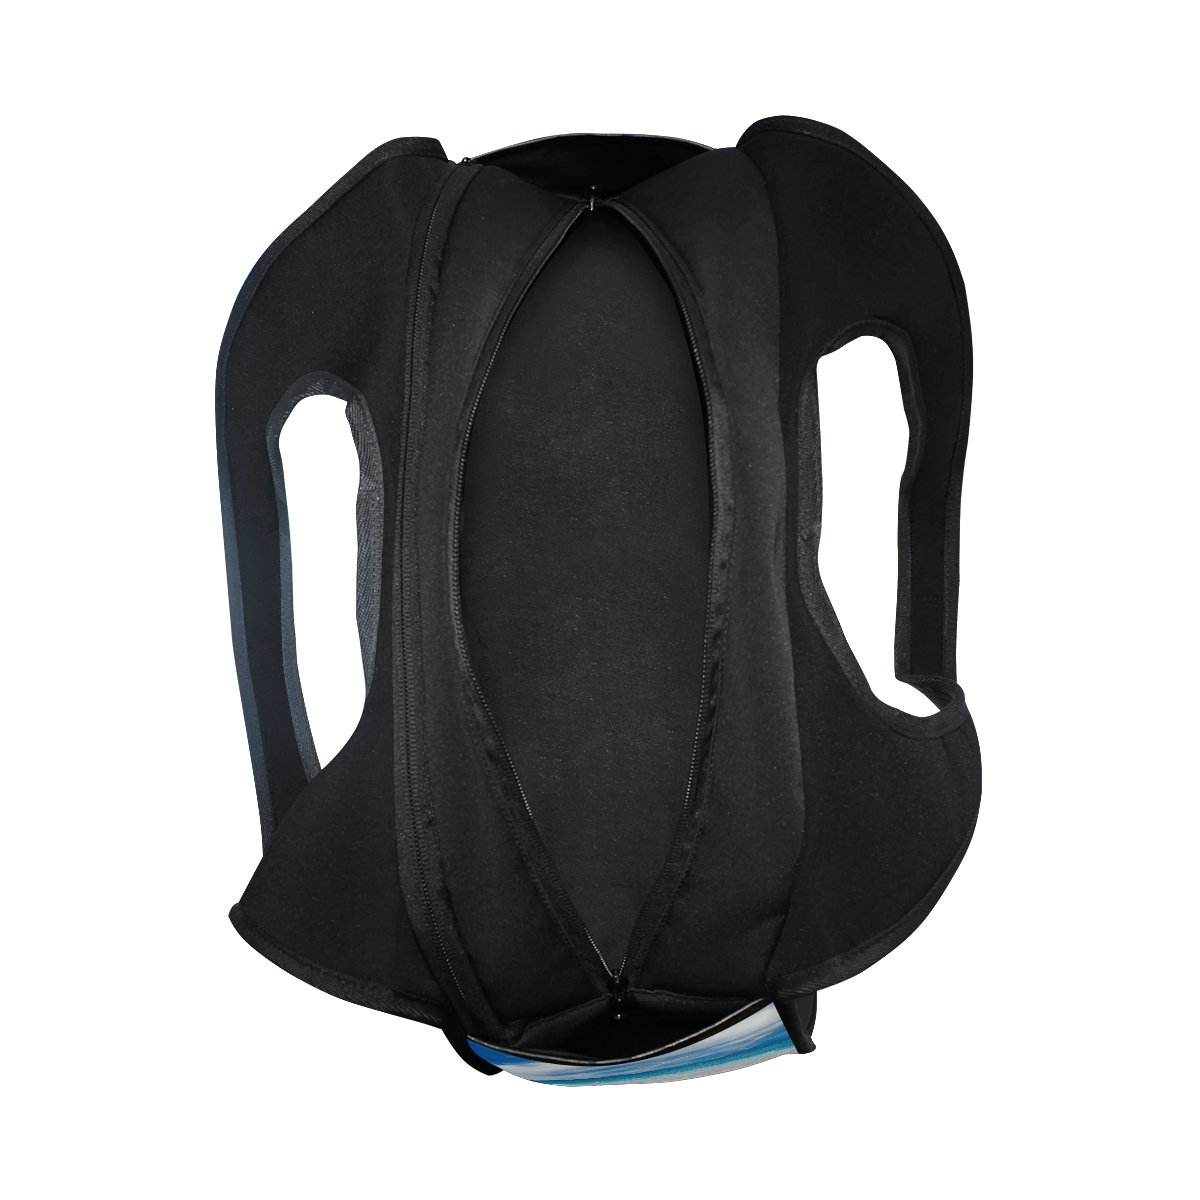 AHOMY Canvas Sports Gym Bag Beach Seawave Sunshine Travel Shoulder Bag